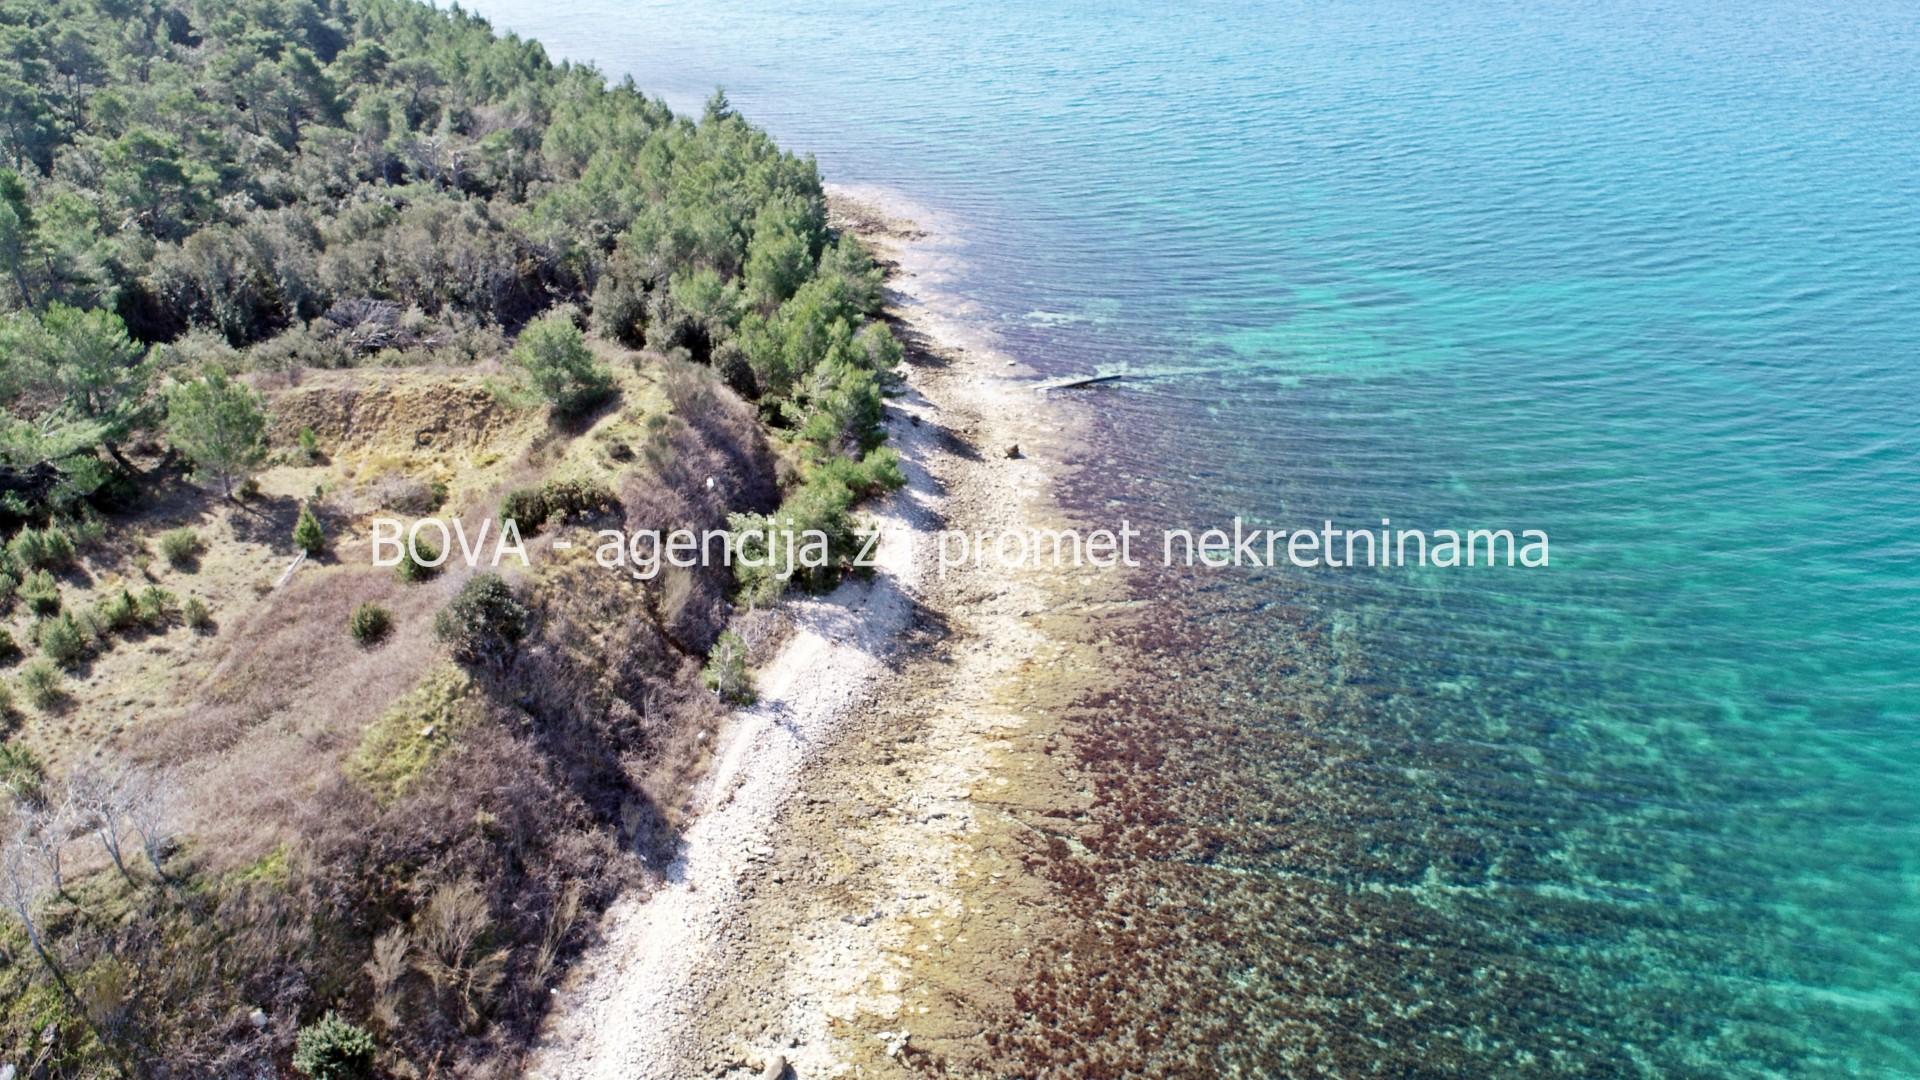 Građevinsko zemljište 4572 m2 u Zatonu, Zadar *PRVI RED DO MORA*